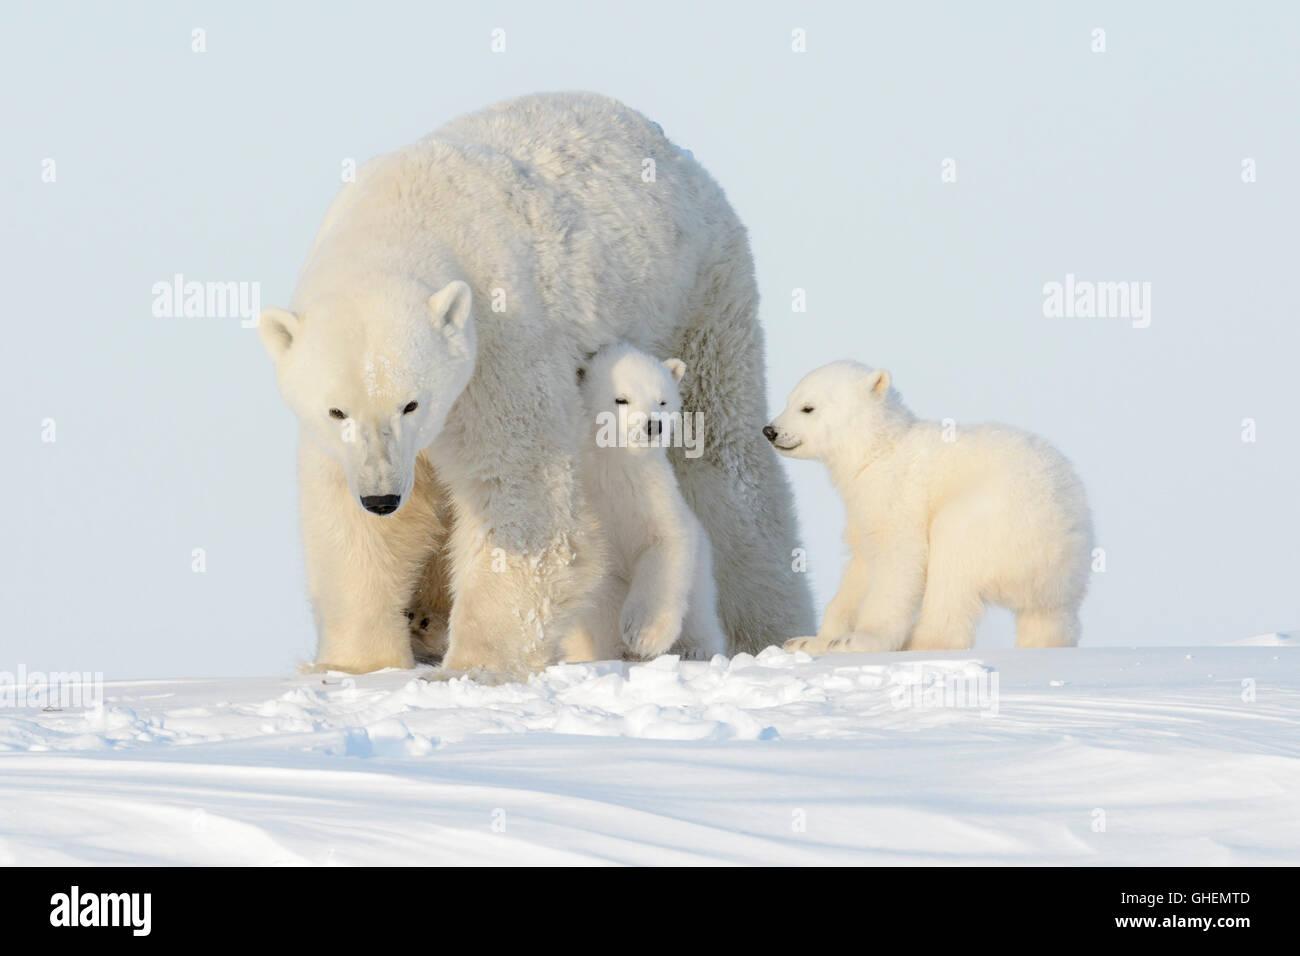 Polar bear mother (Ursus maritimus) walking on tundra with two cubs, Wapusk National Park, Manitoba, Canada - Stock Image